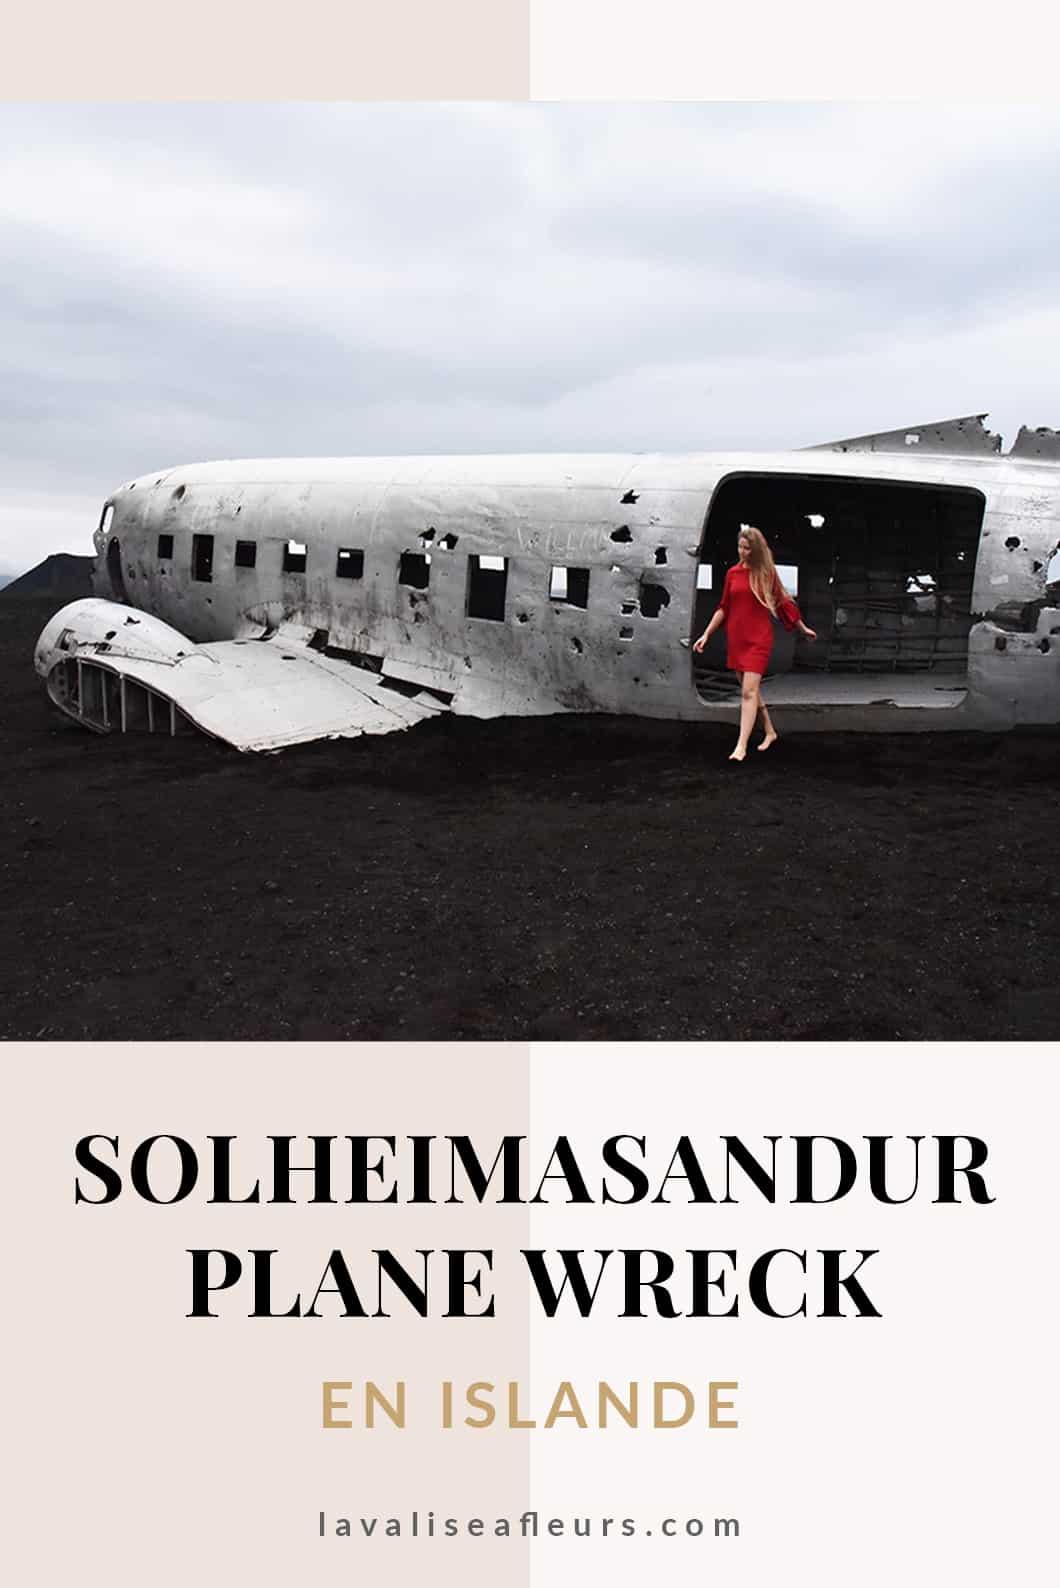 Solheimasandur Plane Wreck, avion abandonné en Islande